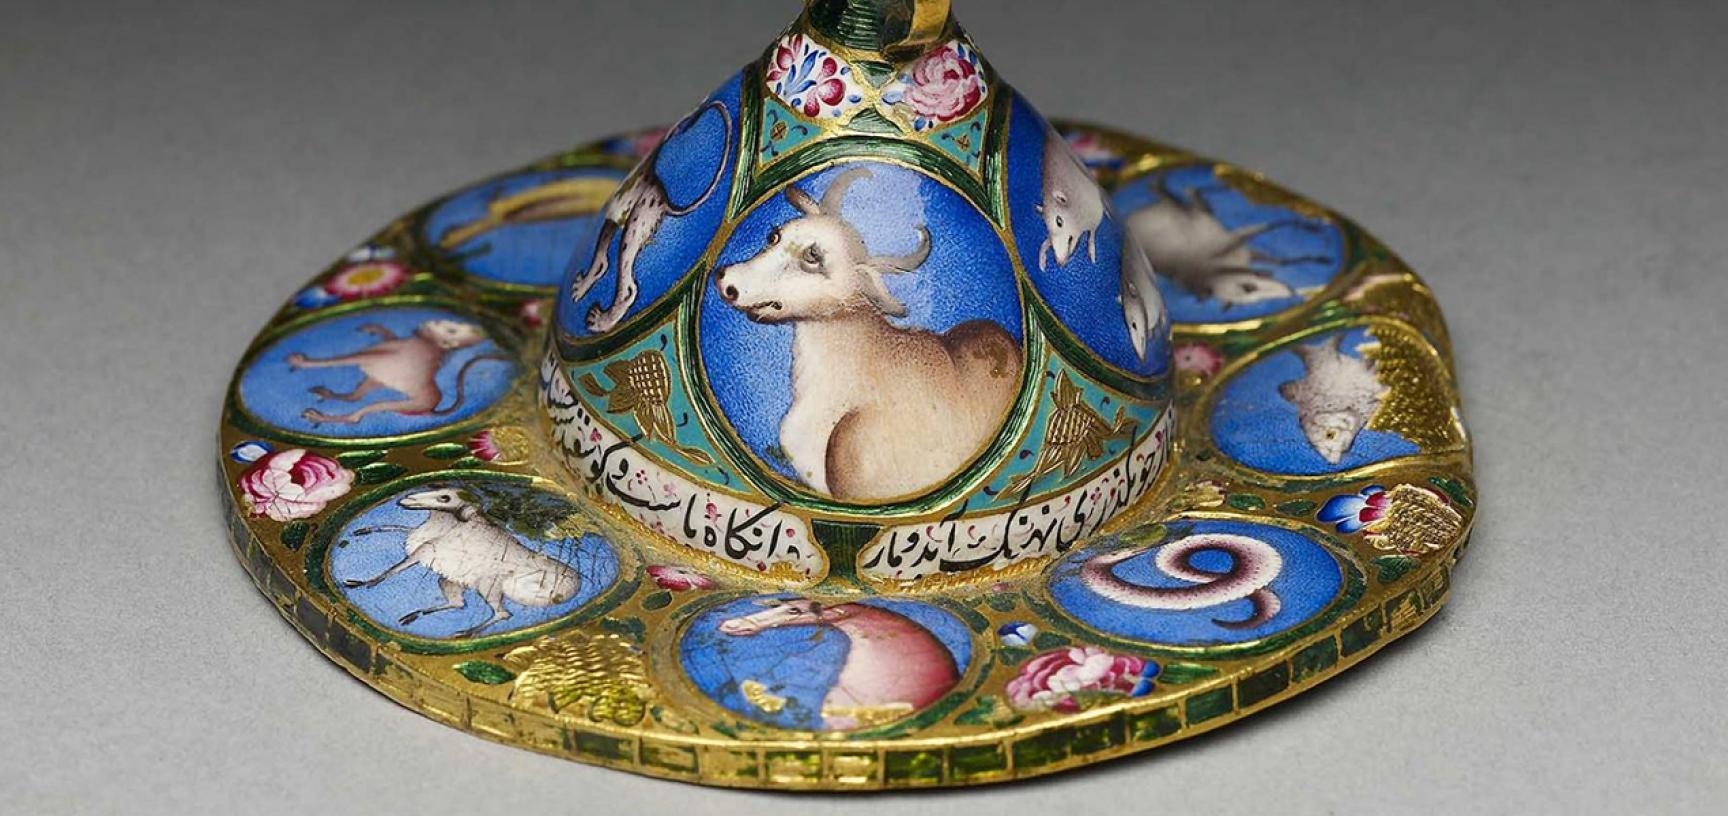 Image © Ashmolean Museum, University of Oxford.